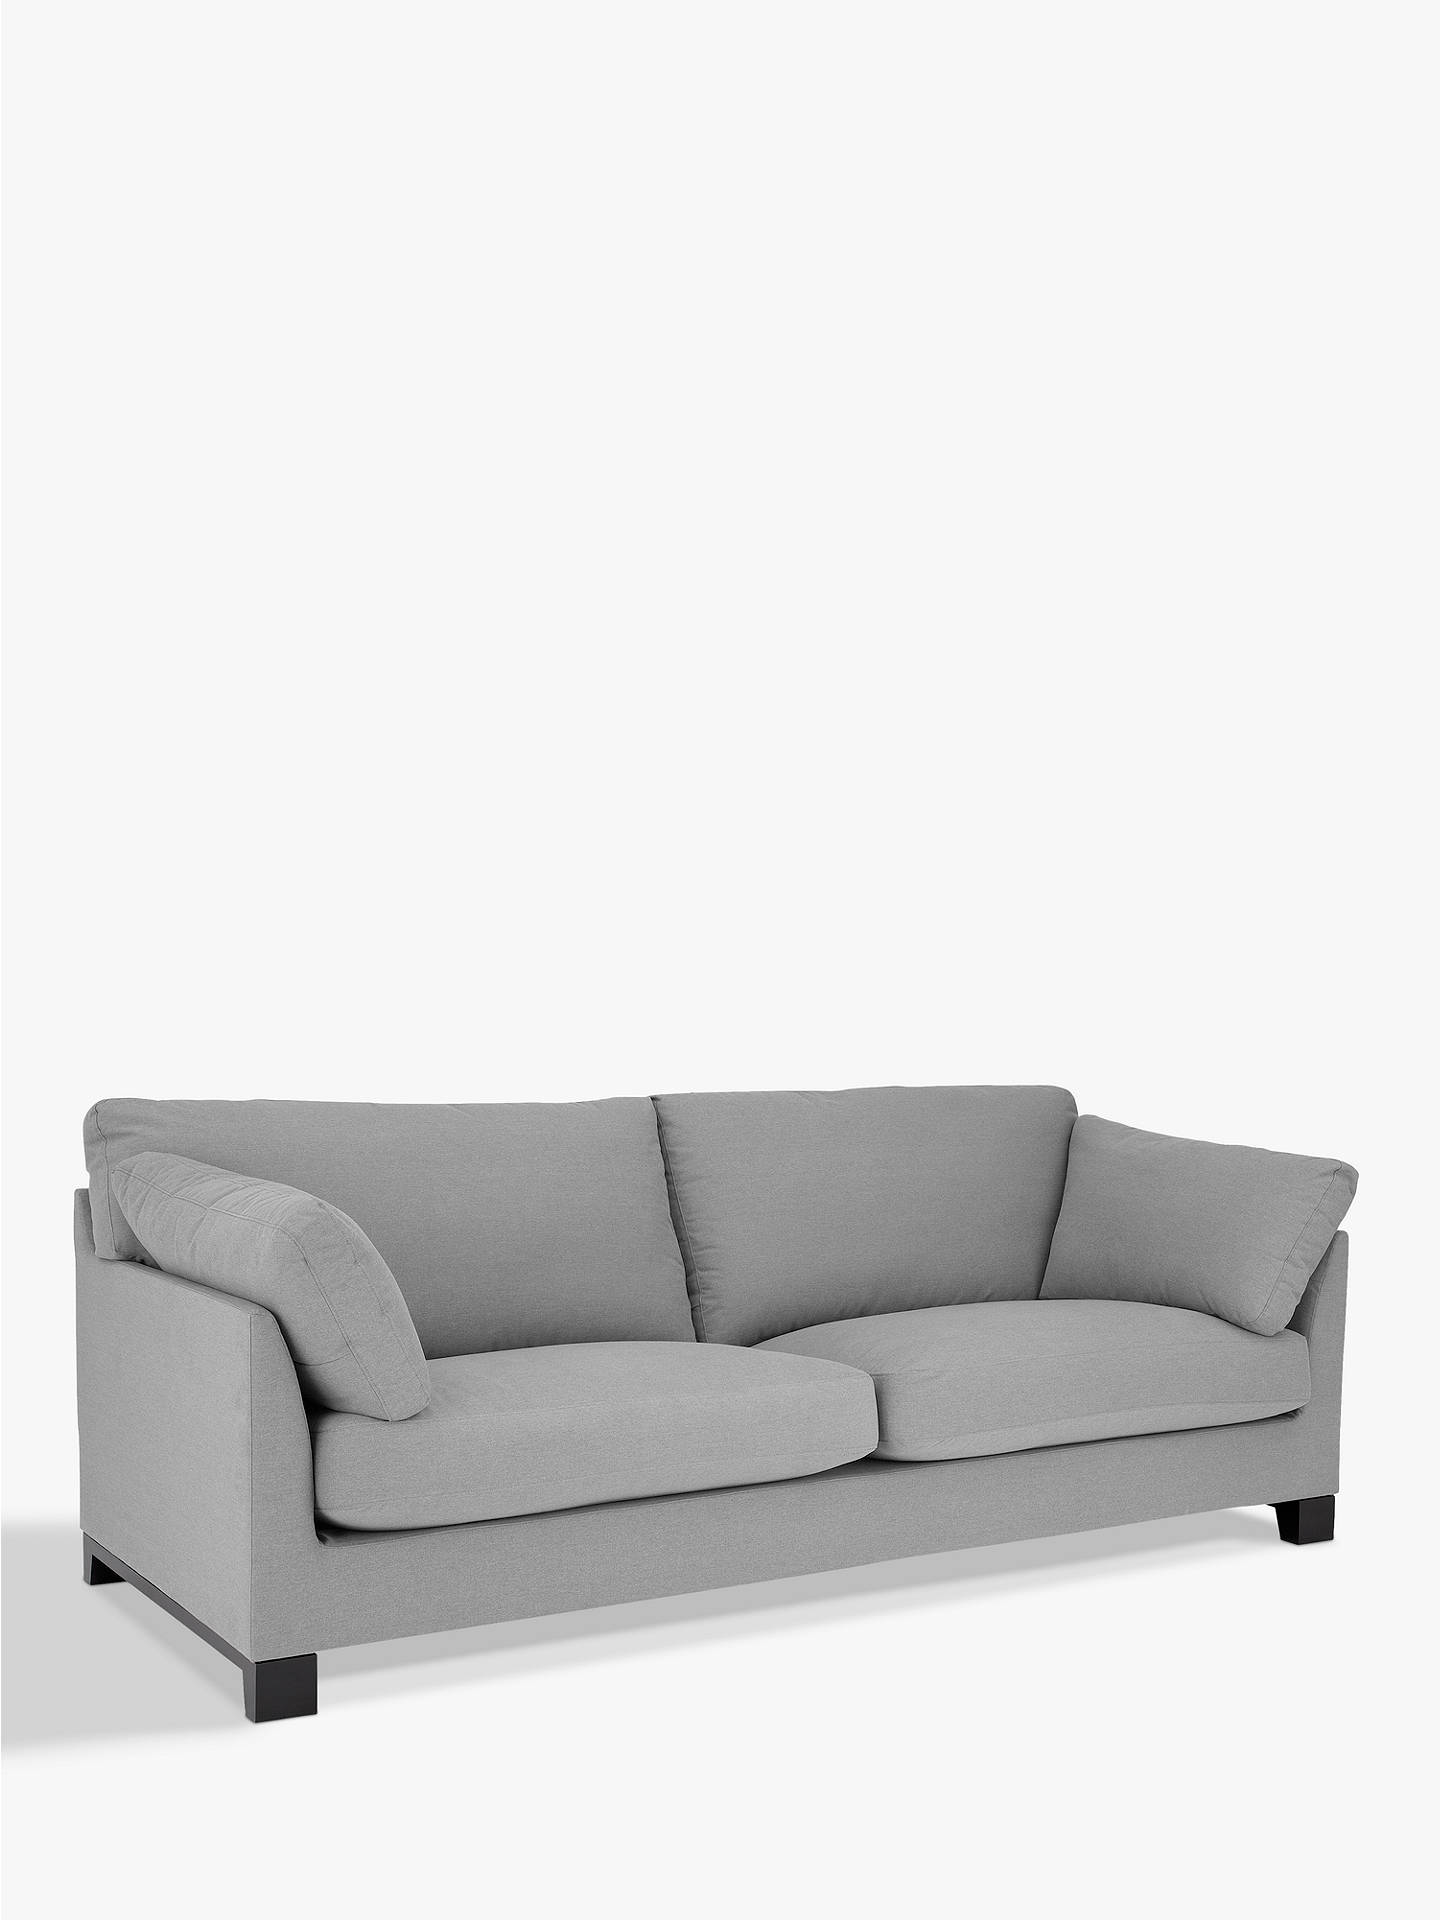 John Lewis & Partners Ikon Grand 4 Seater Sofa at John Lewis & Partners